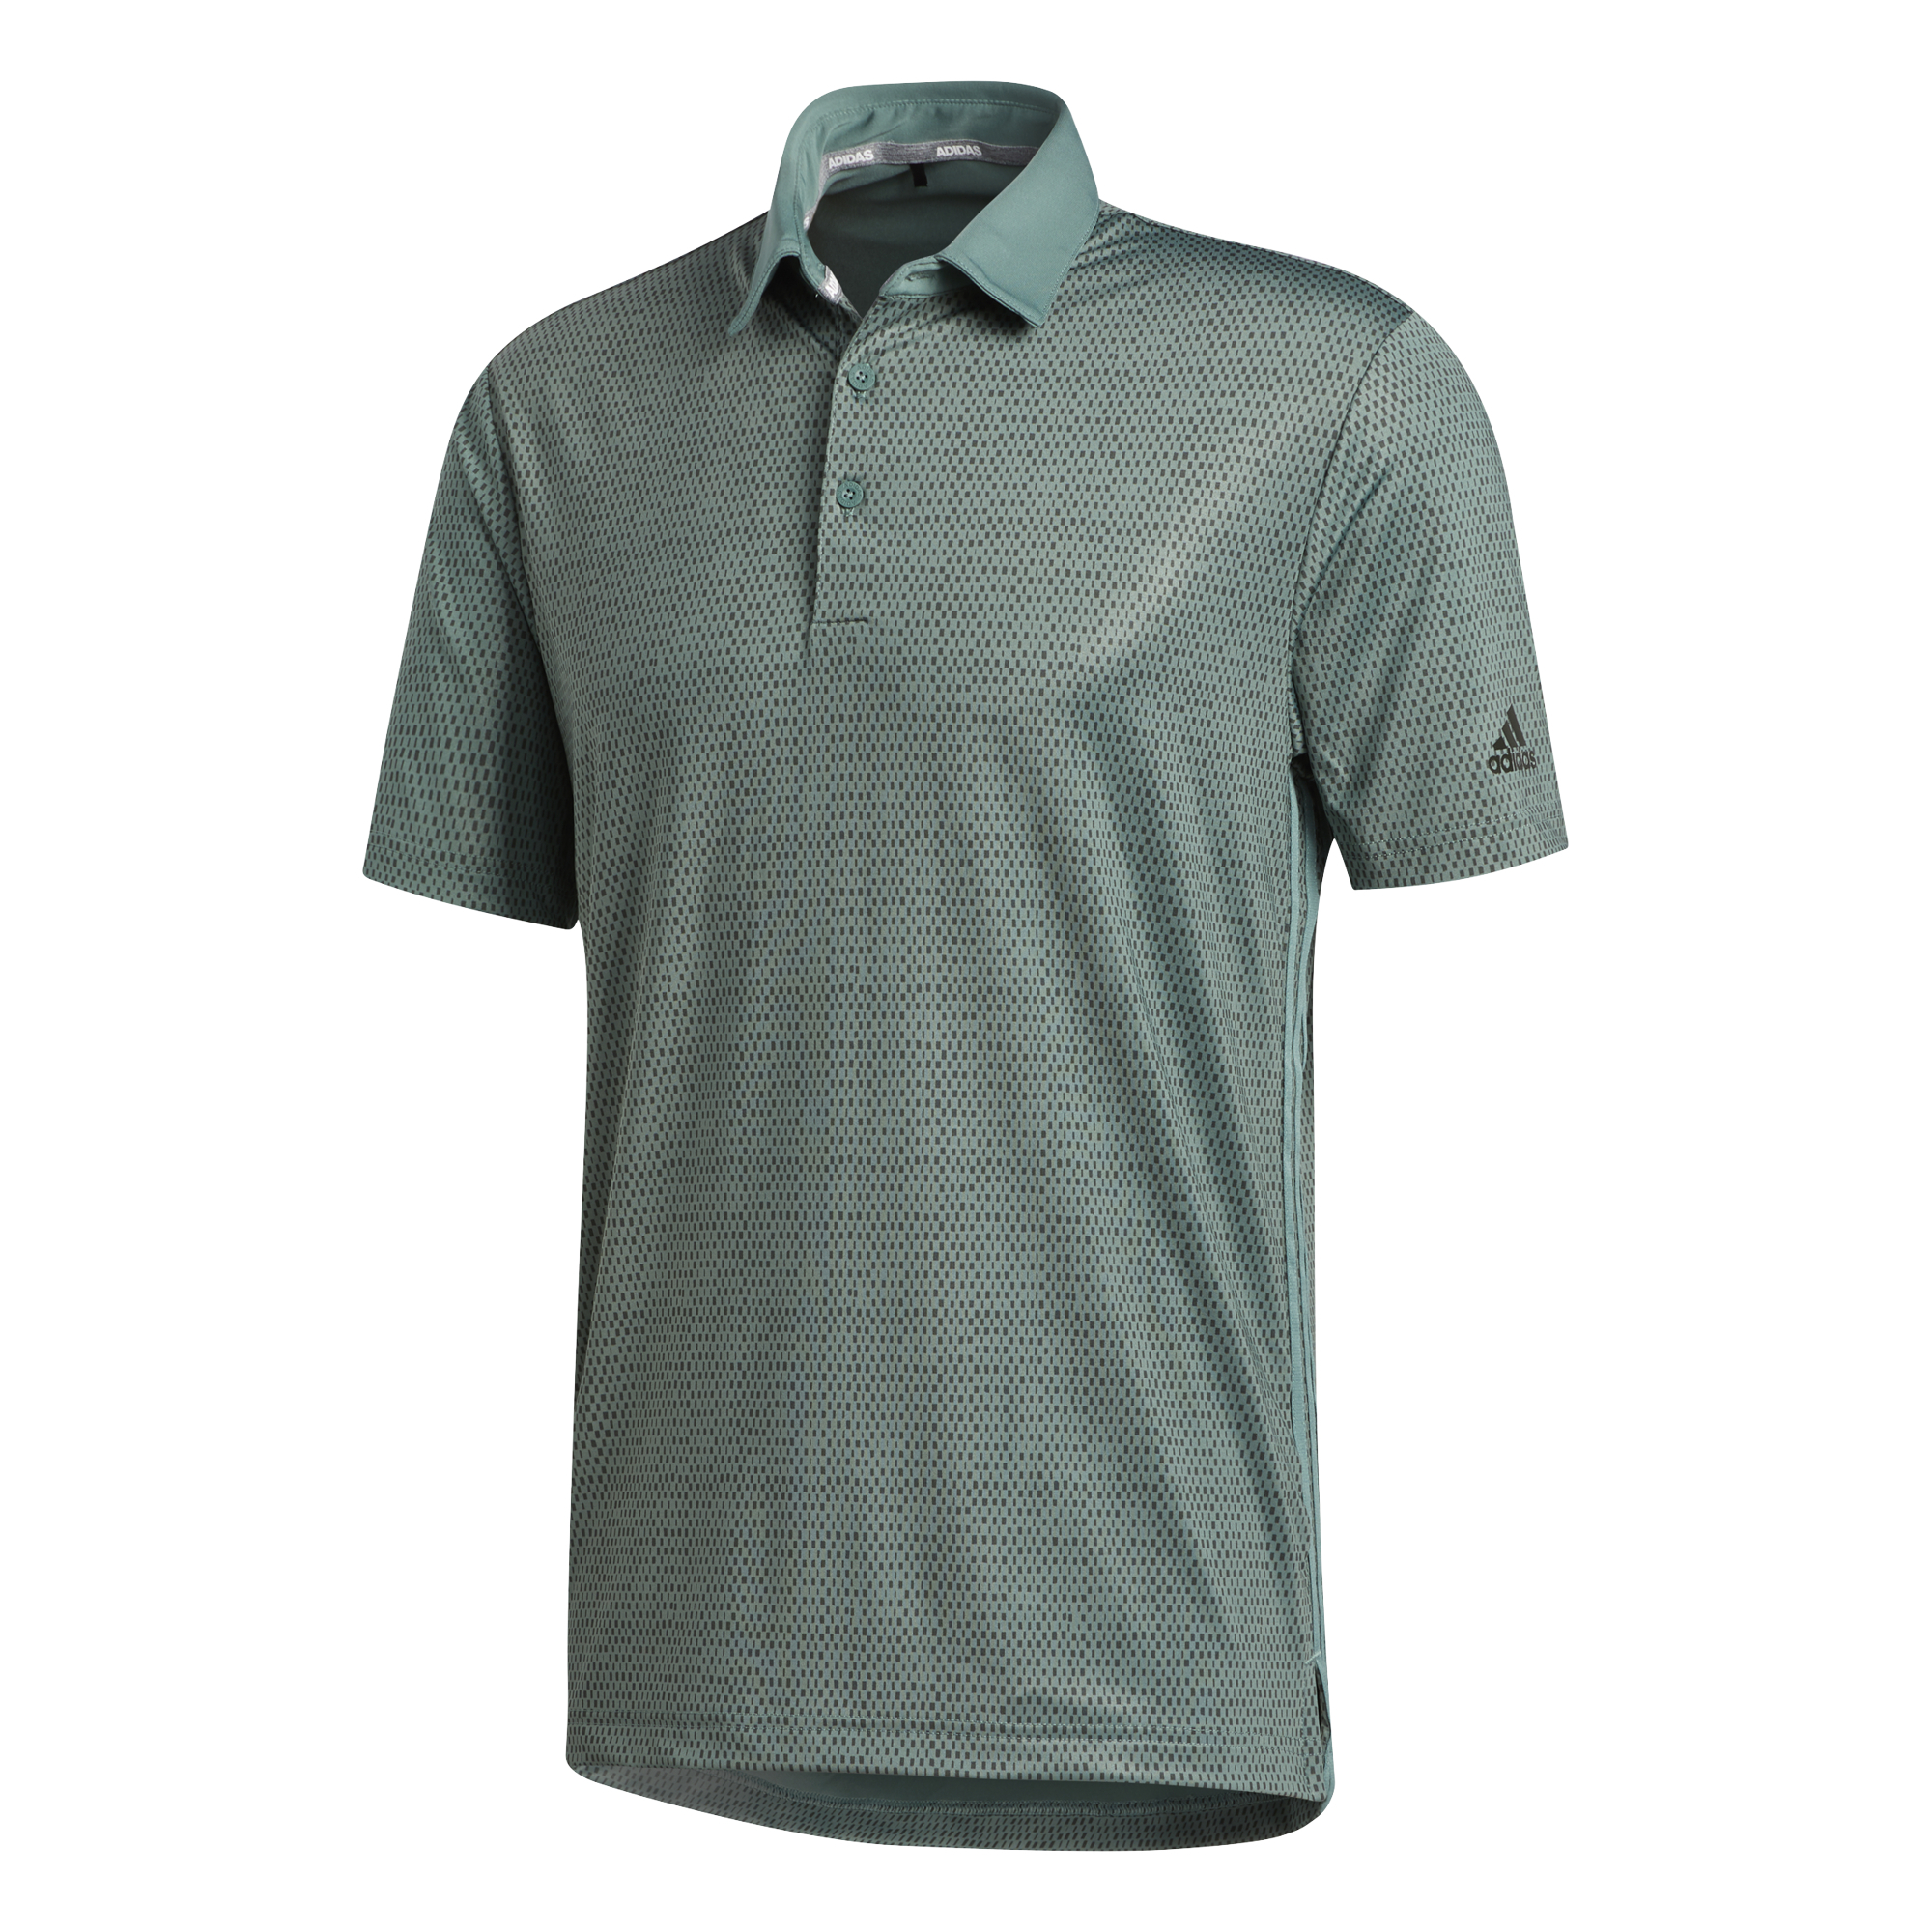 adidas Golf Mens Ultimate365 Polo Shirt  - Tech Emerald / Legend Earth